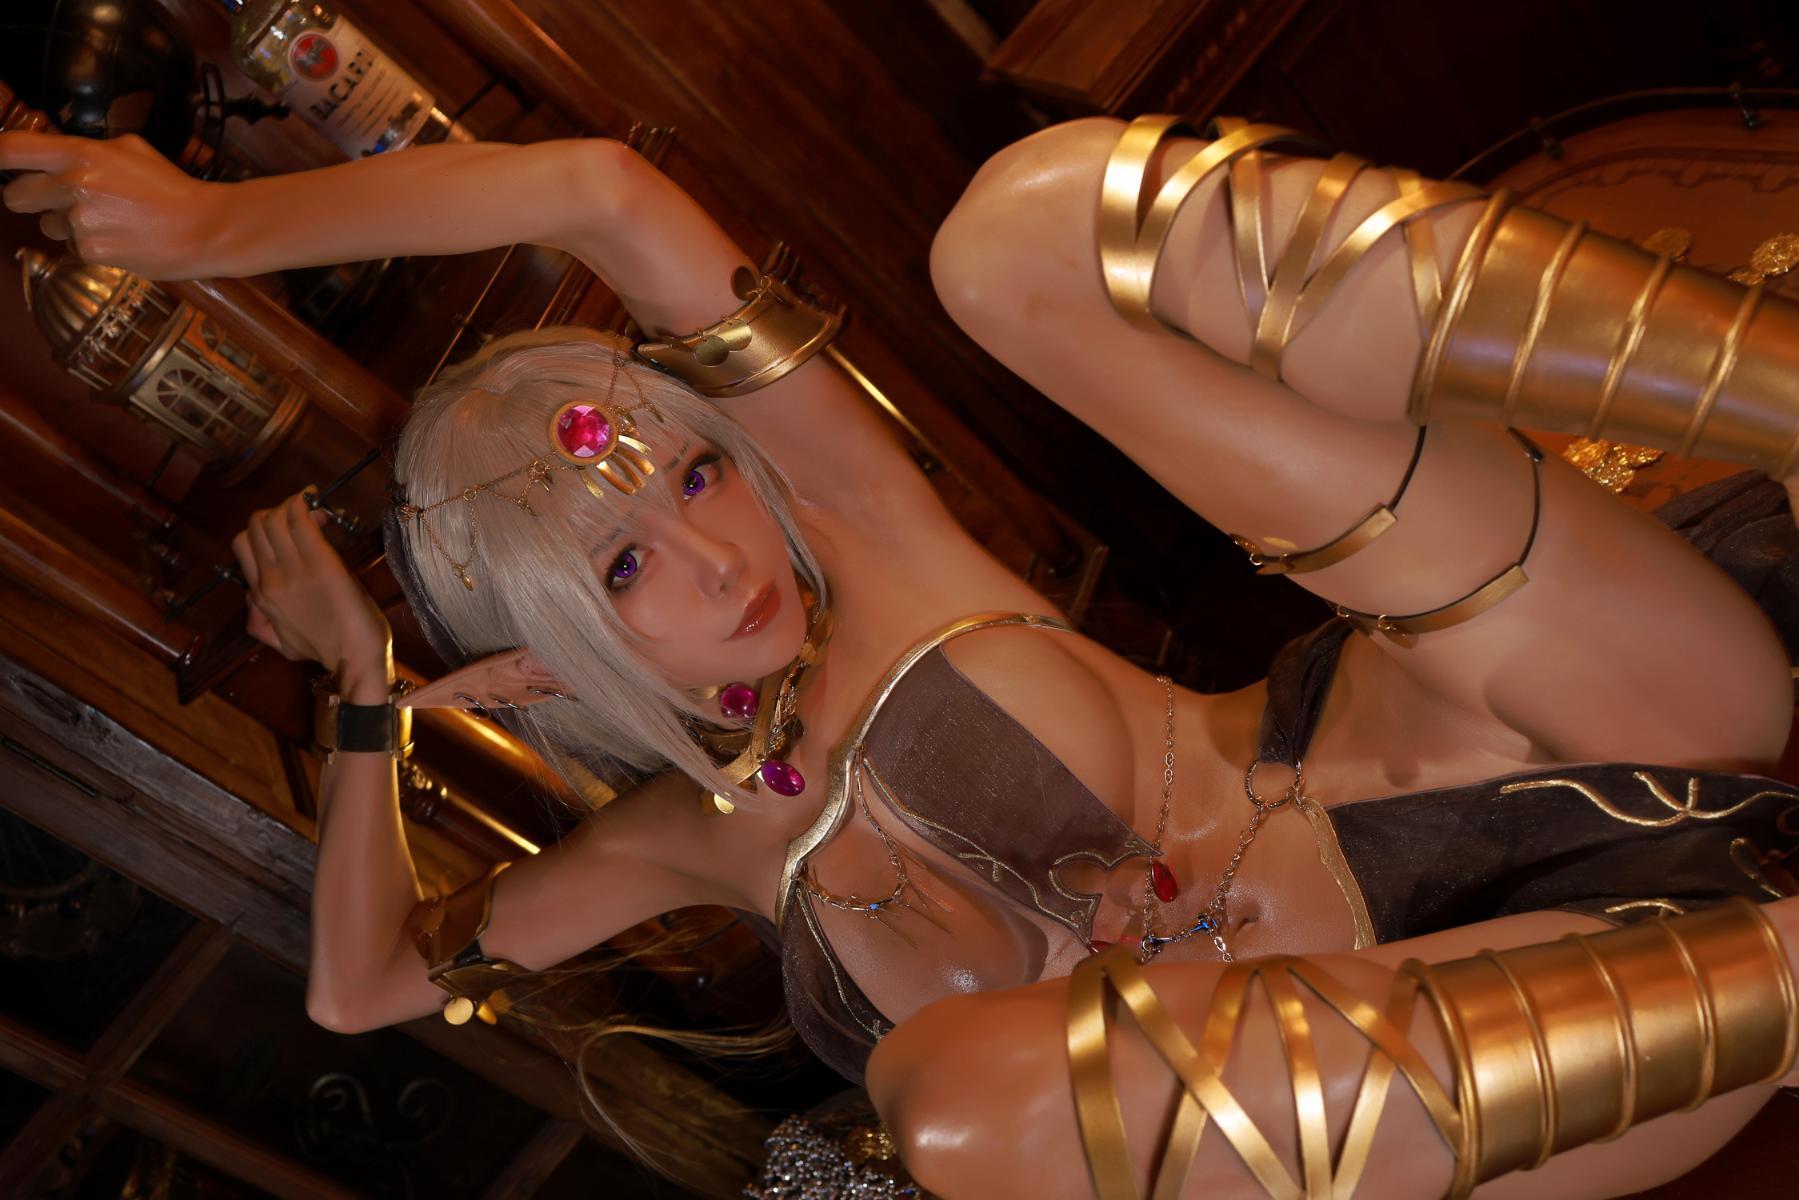 Tan Dancer Elf Succubus Cosplay by Aqua 30